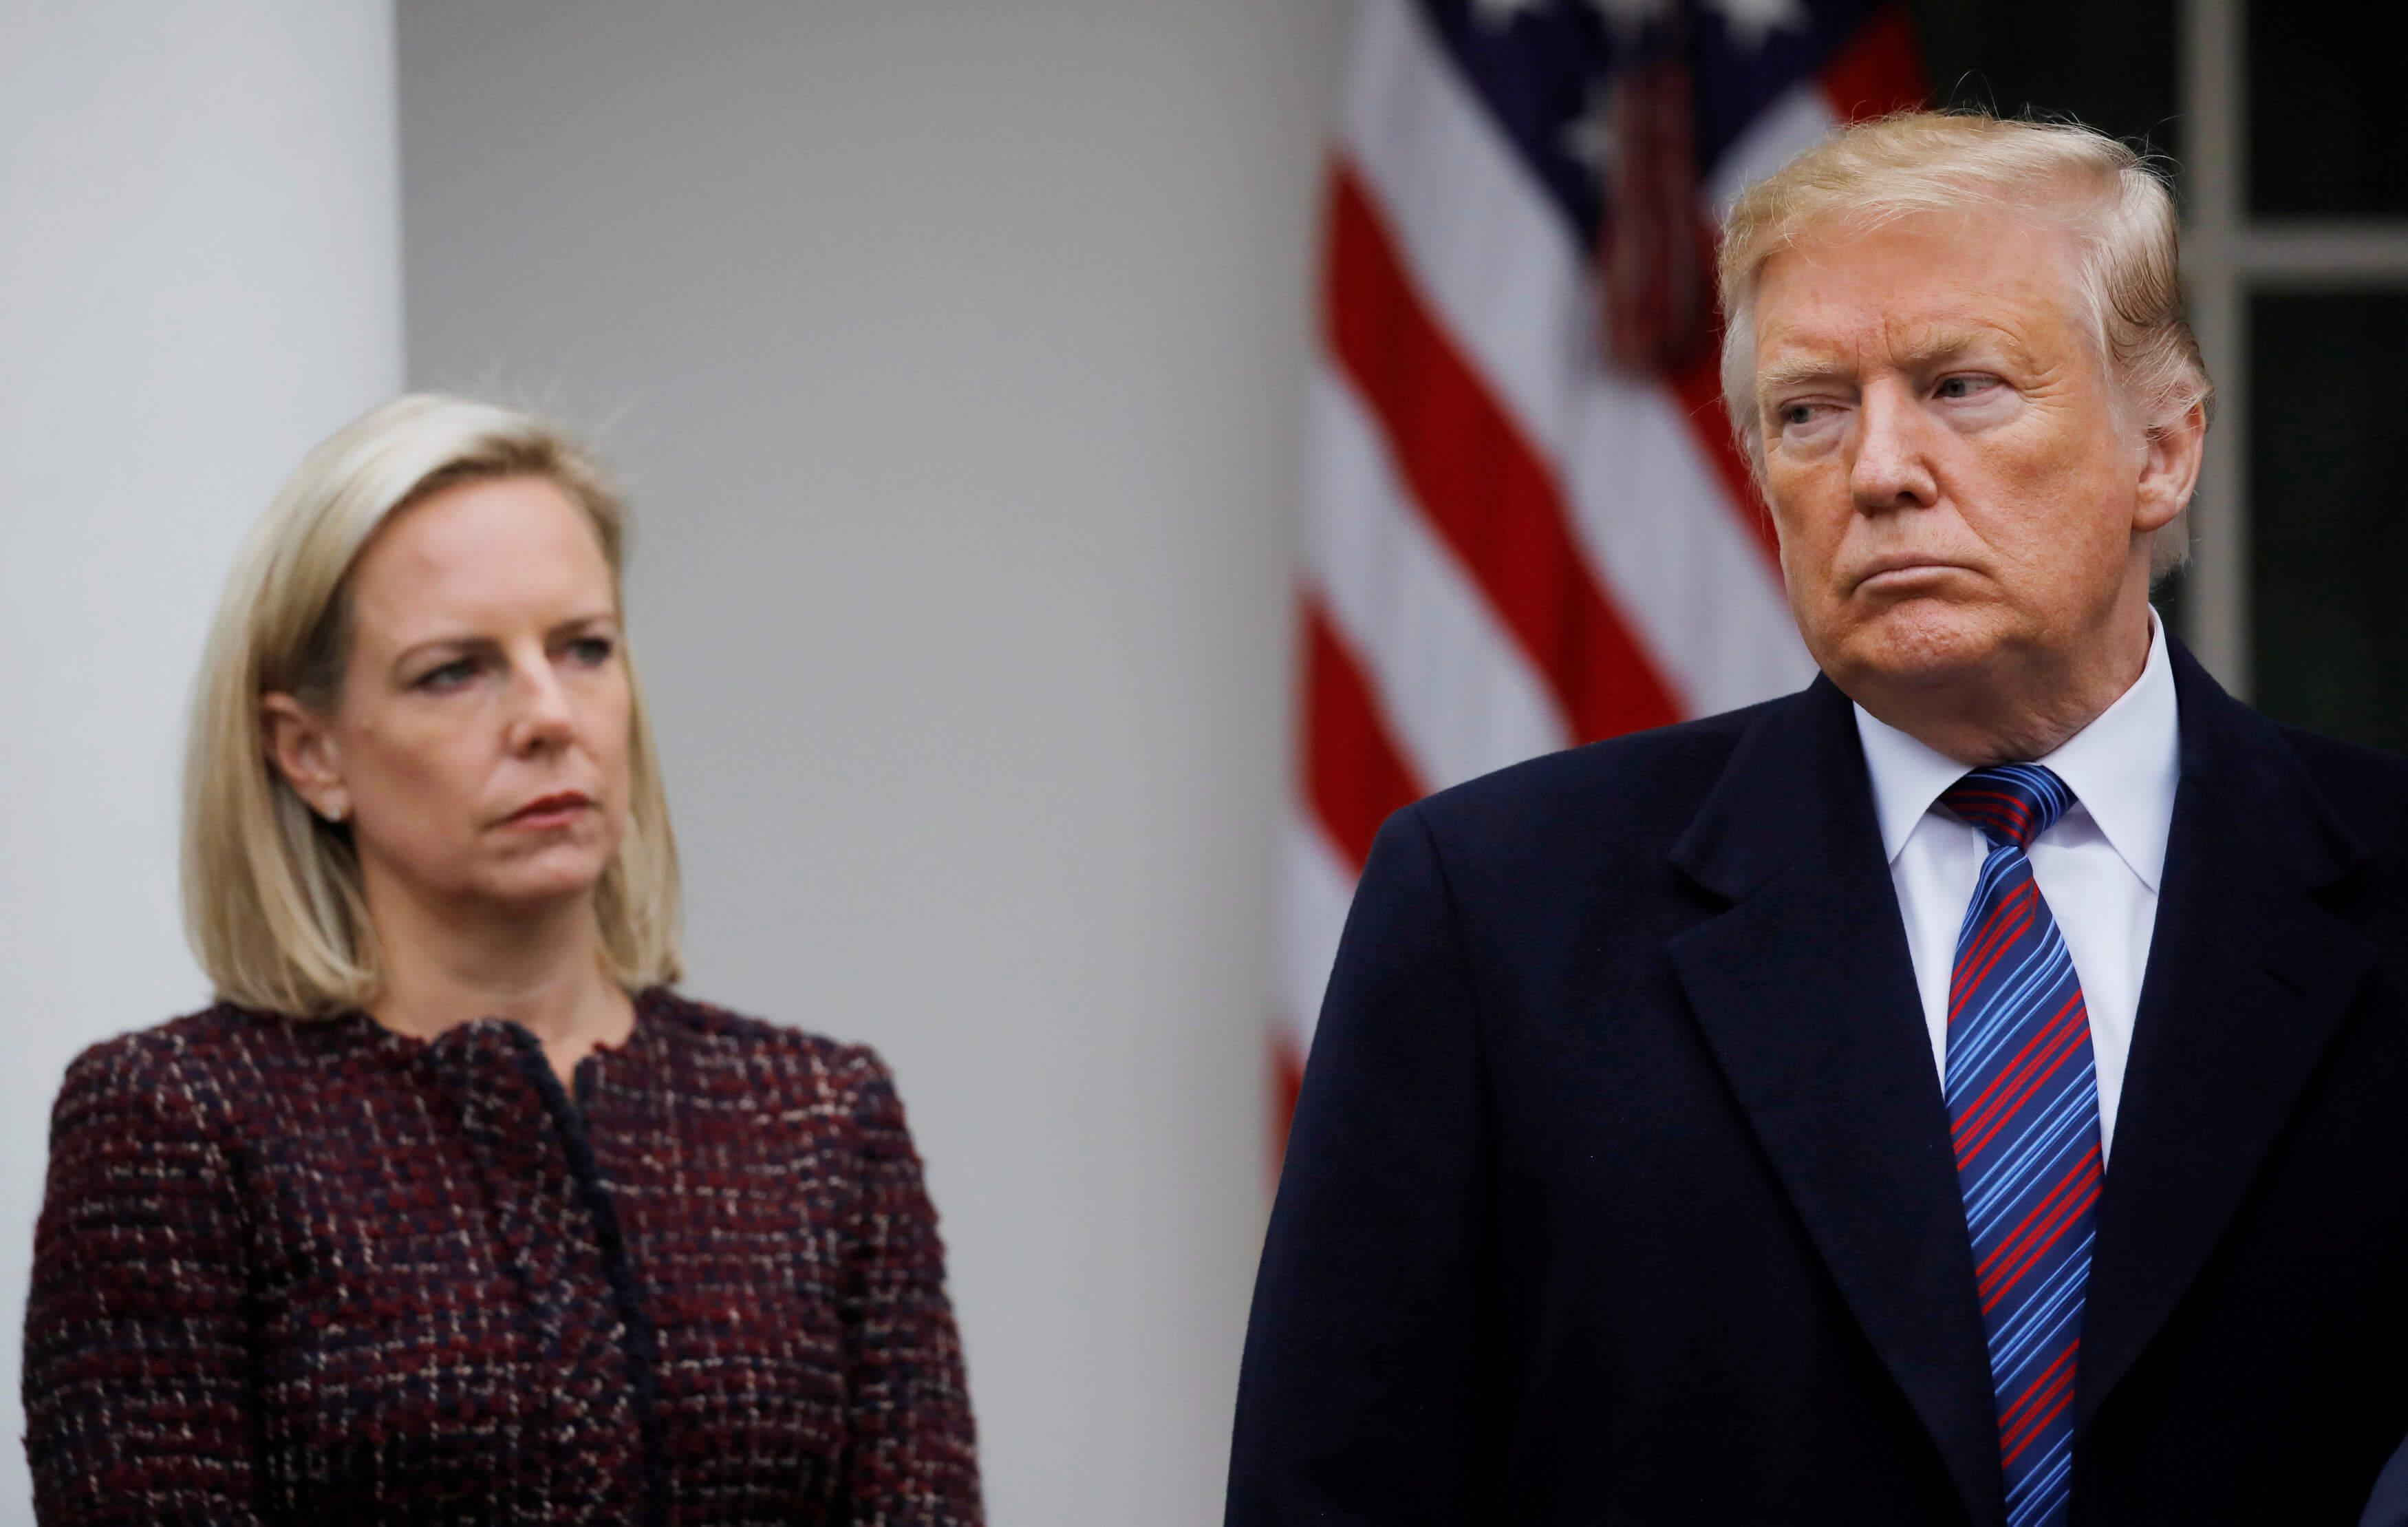 The Apprentice στο Λευκό Οίκο – Απέλυσε και δεύτερο υπουργό μέσω twitter ο Ντόναλντ Τραμπ